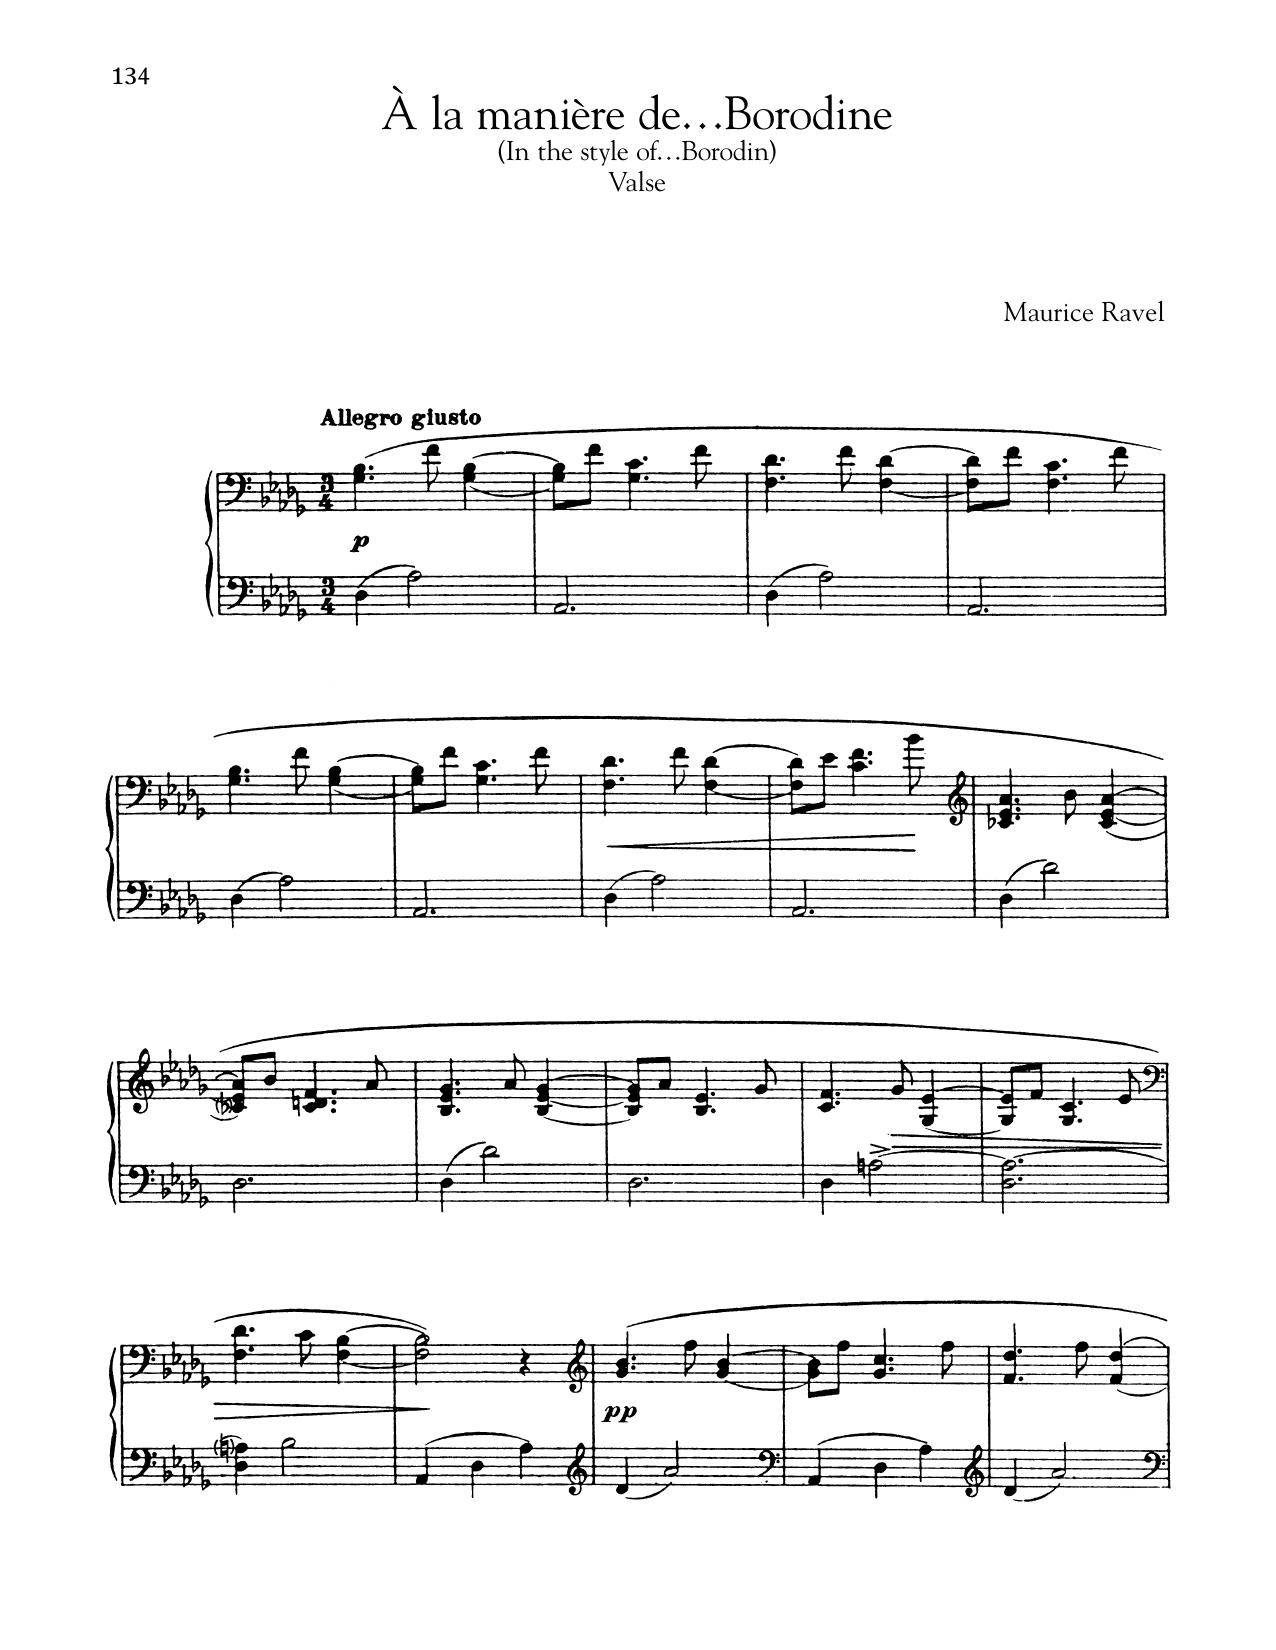 Maurice Ravel A La Maniere De Borodine (Valse) sheet music notes and chords